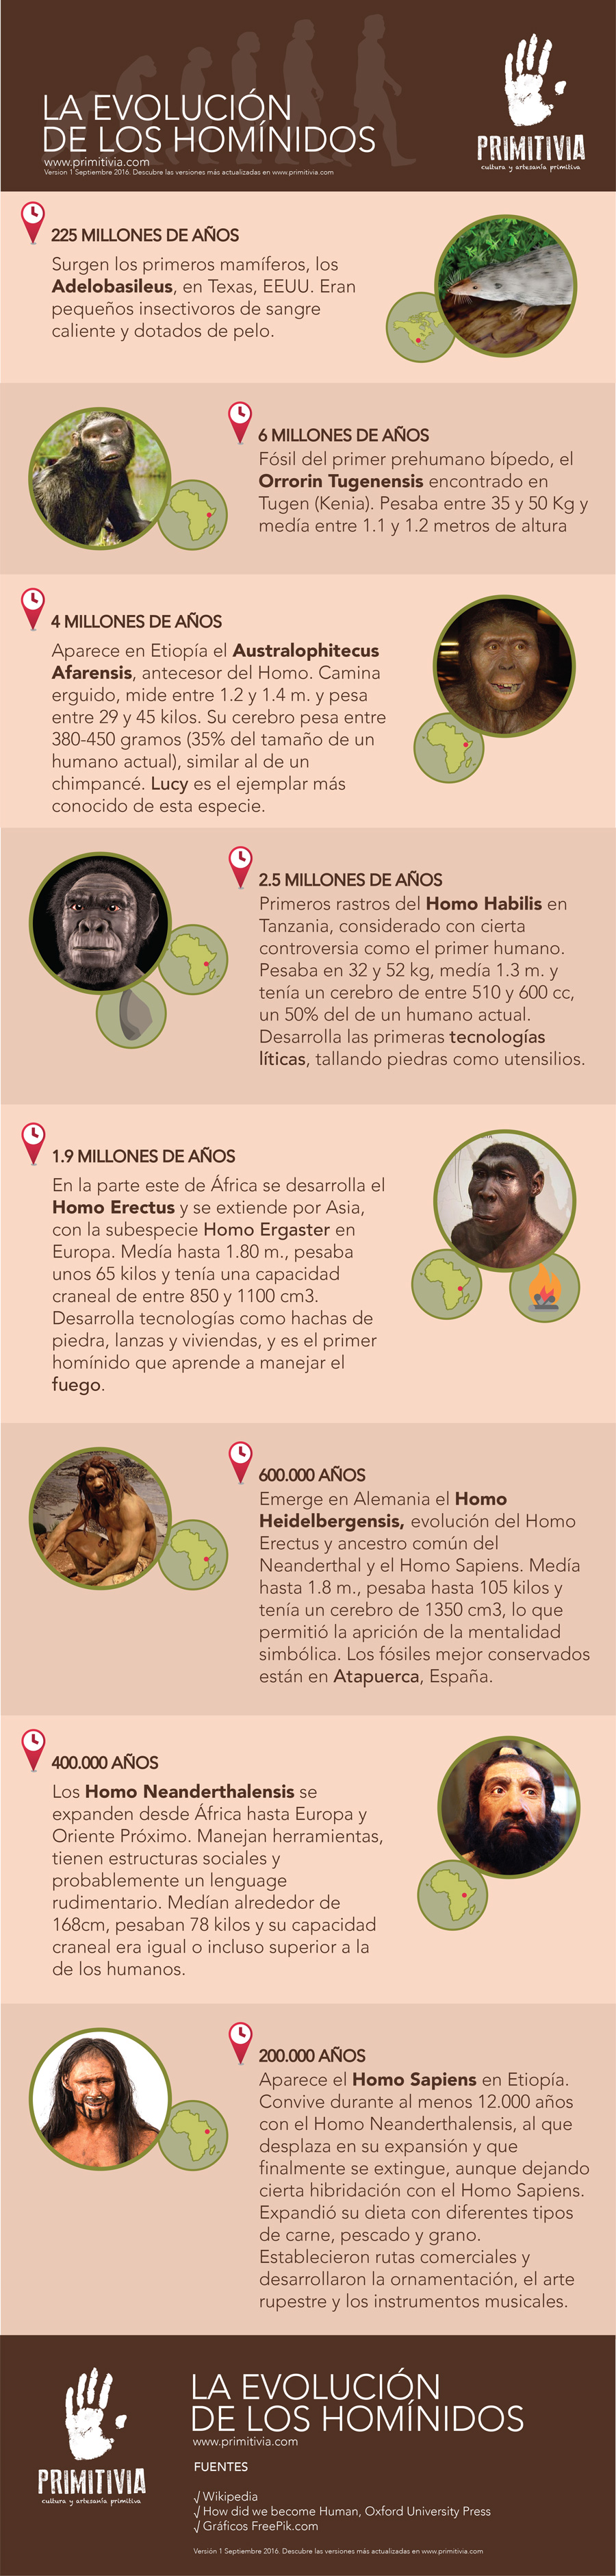 evolucion-hominidos-primitivia